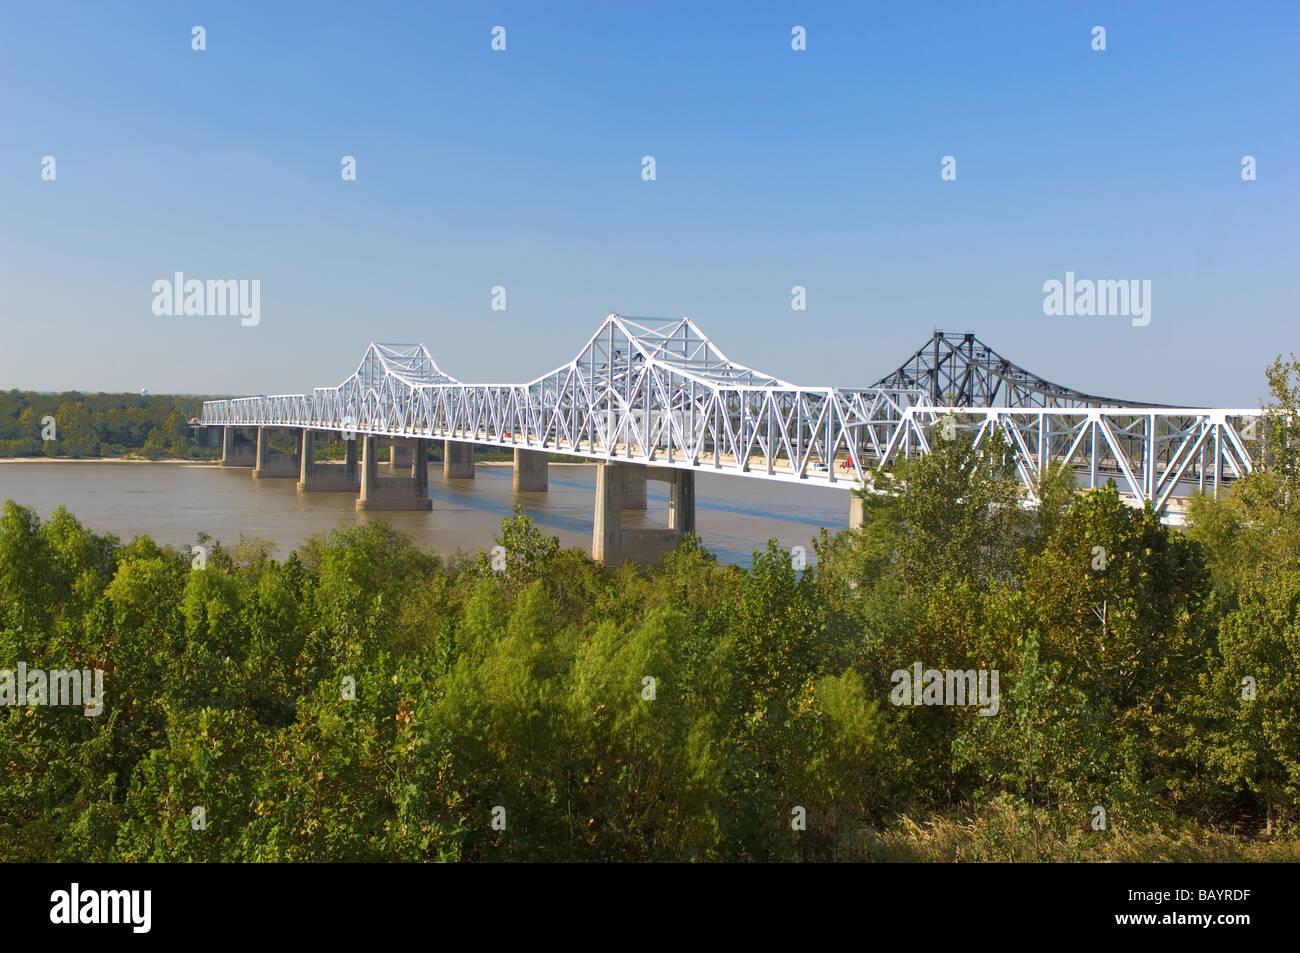 I 20 Bridge over the Mississippi River in Vicksburg Mississippi - Stock Image